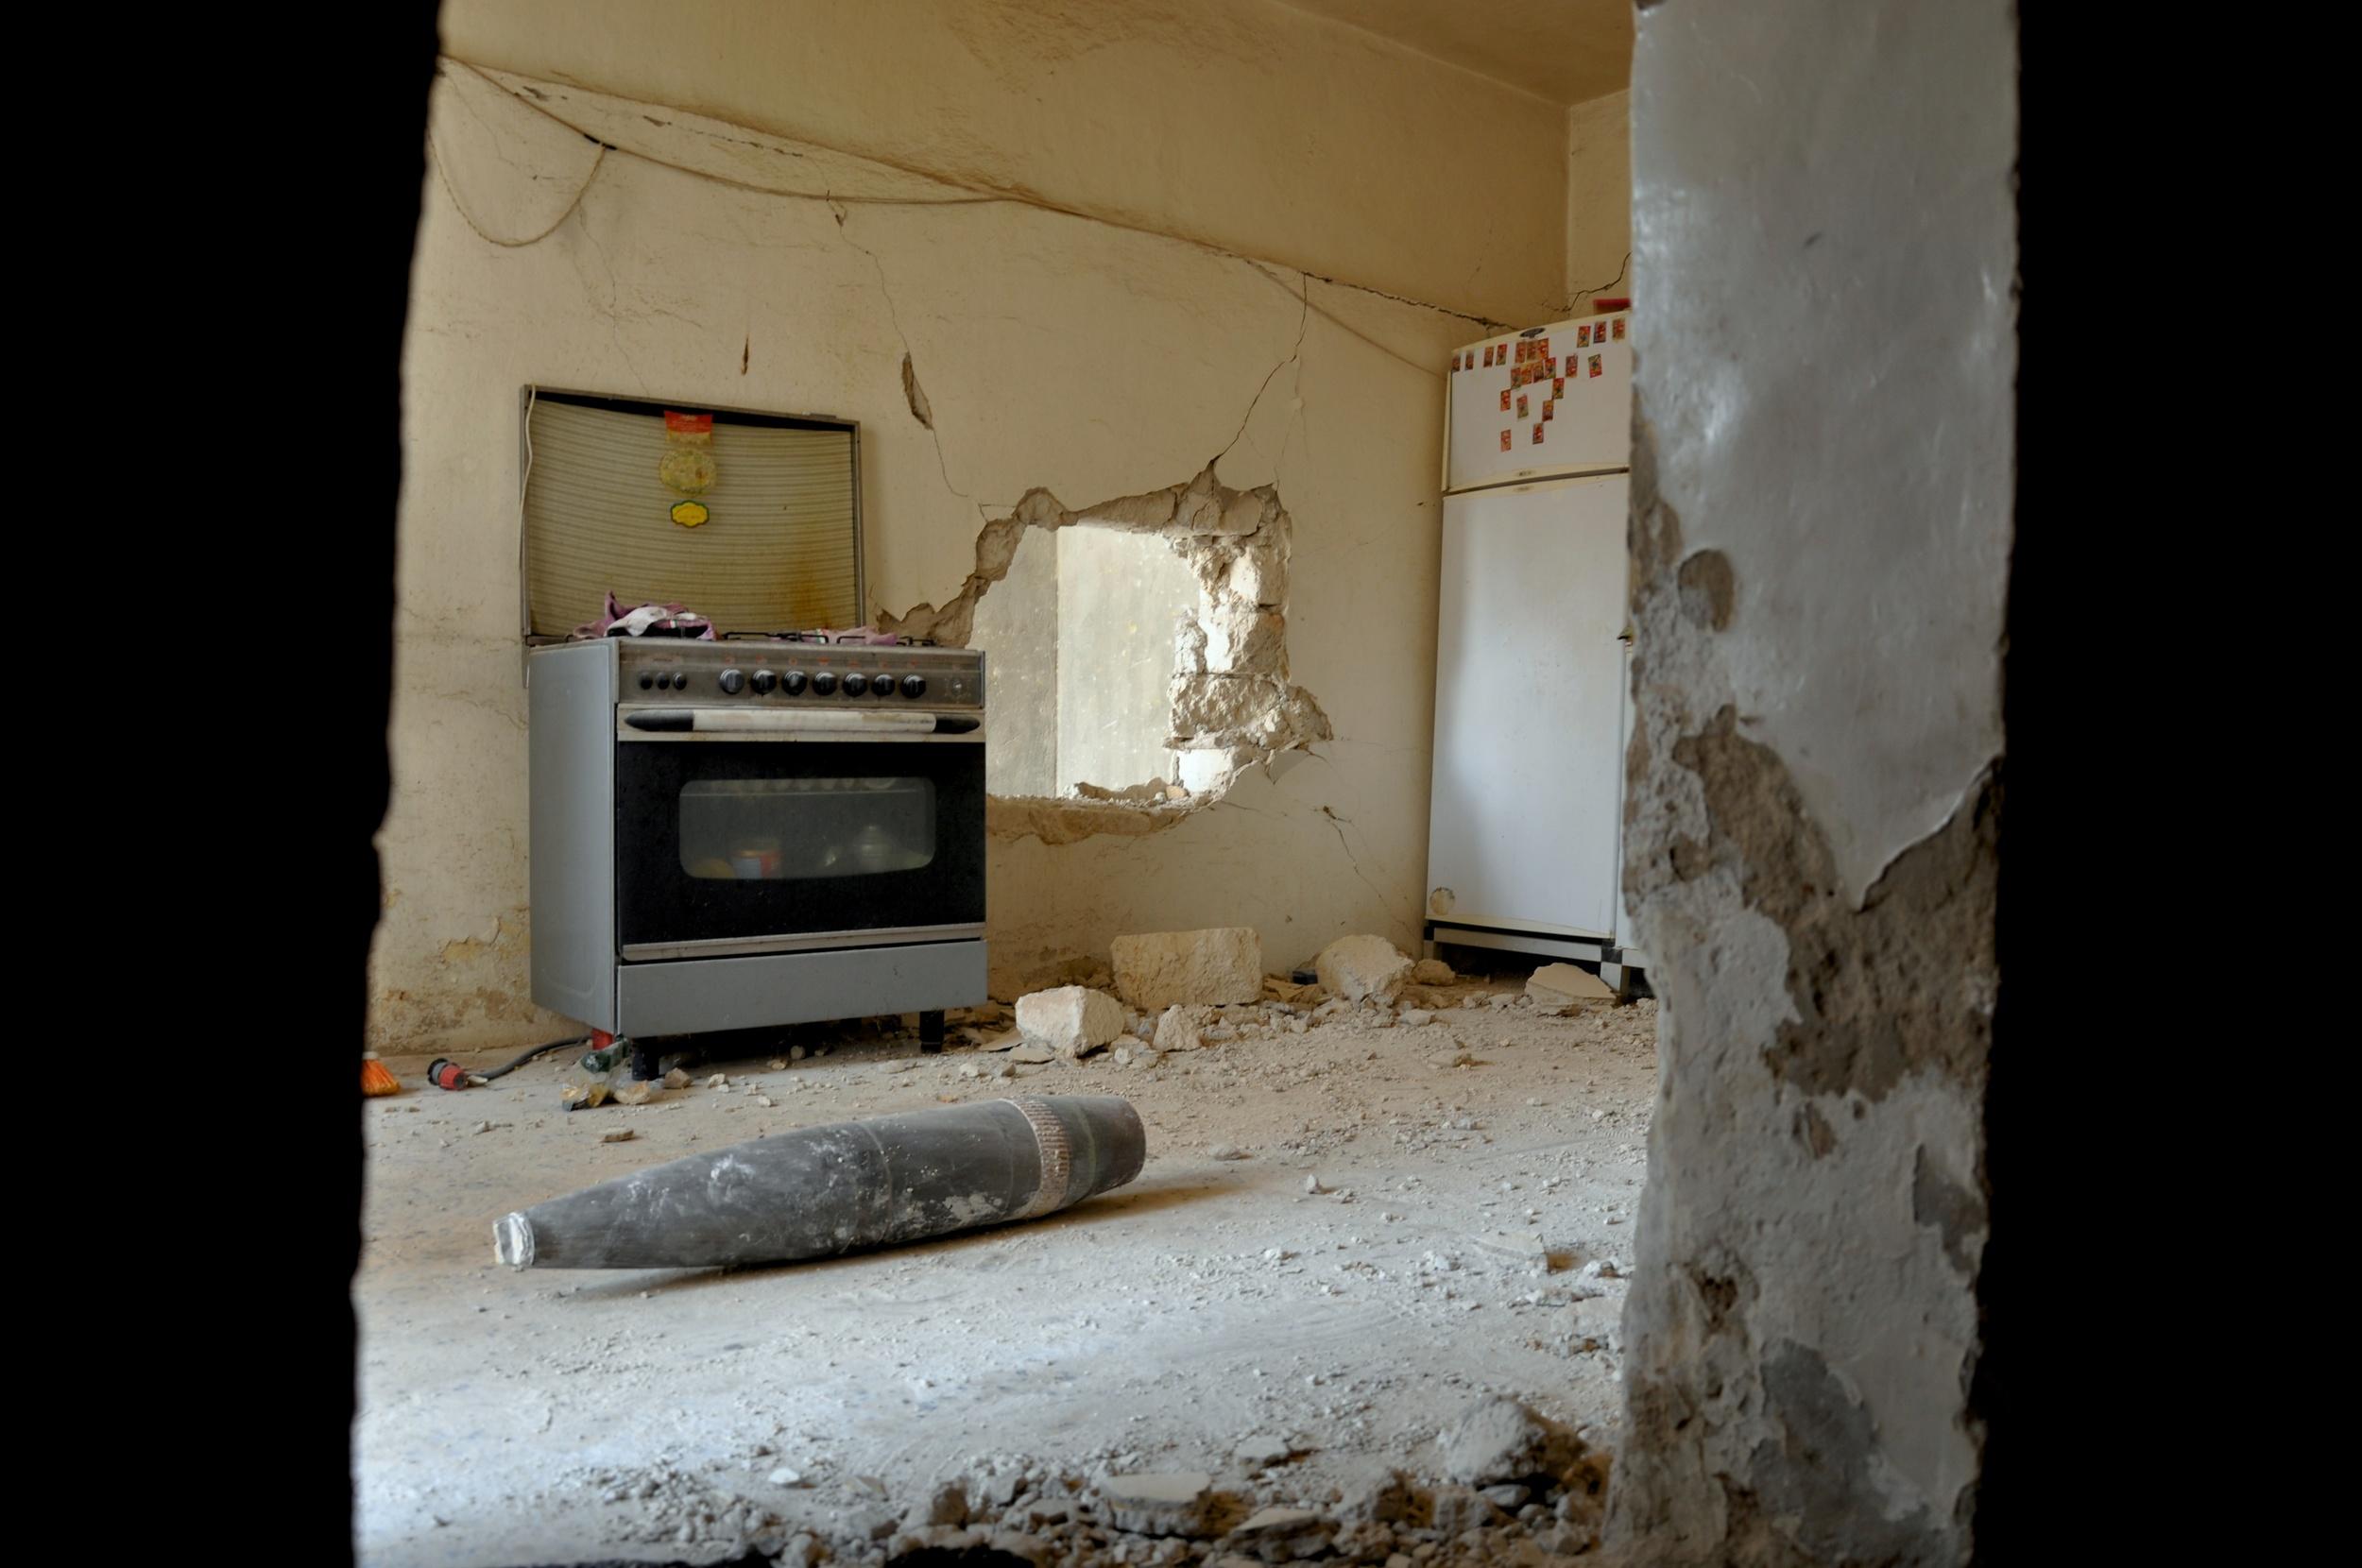 Weapon contamination in Libya - Sirte, April 2011 ©ICR